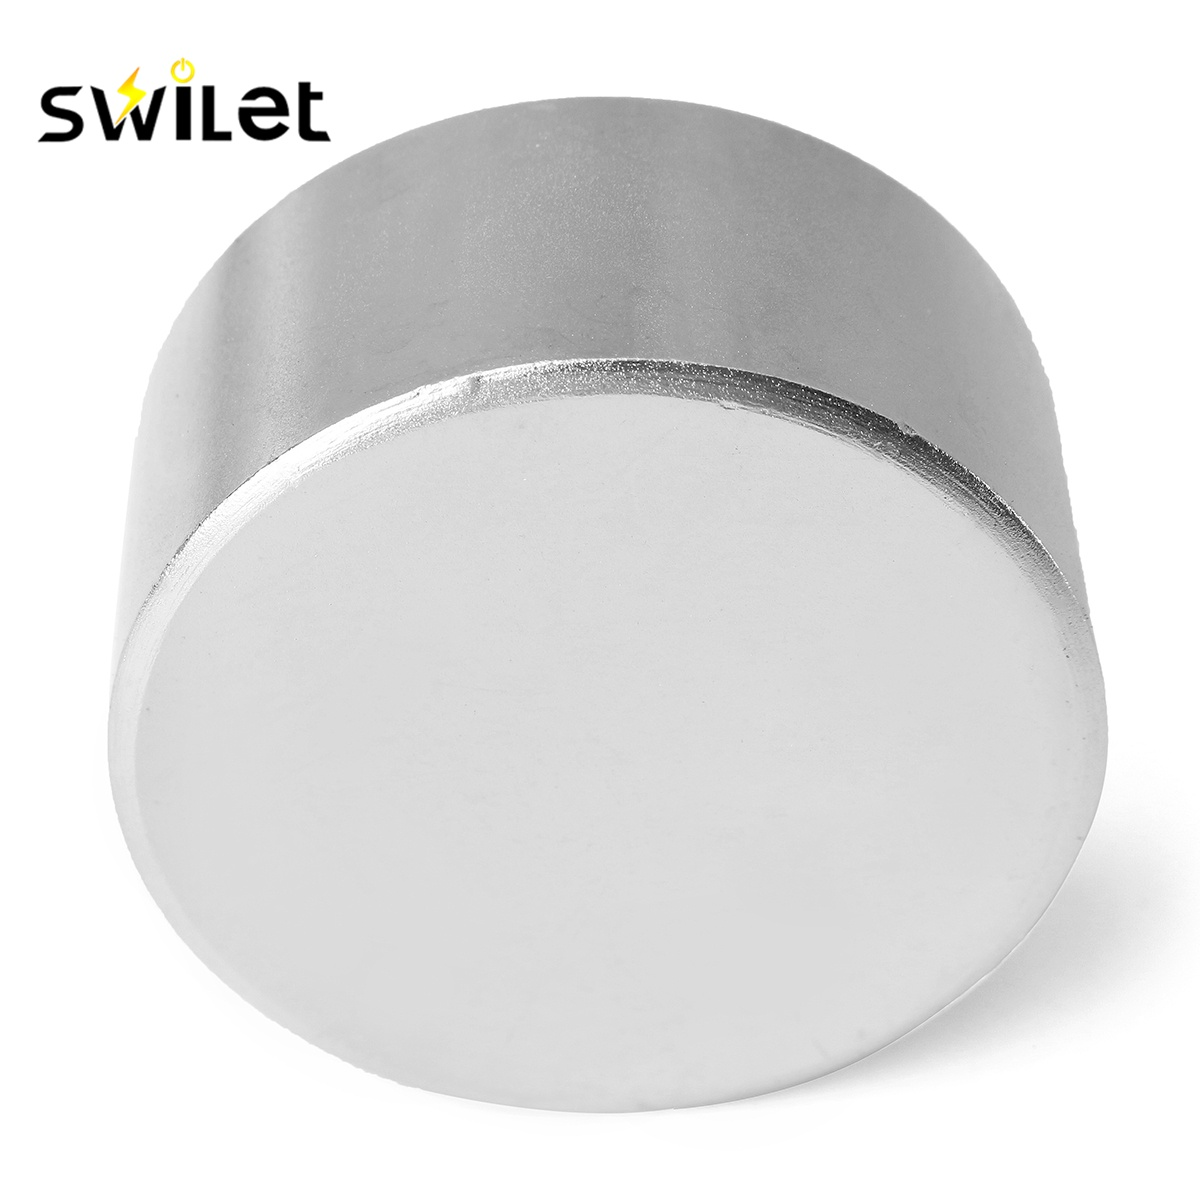 все цены на SWILET Block 40x40x20mm Super Strong N52 High Quality Rare Earth Neo Magnet Neodymium Powerful Permanent Magnetic онлайн